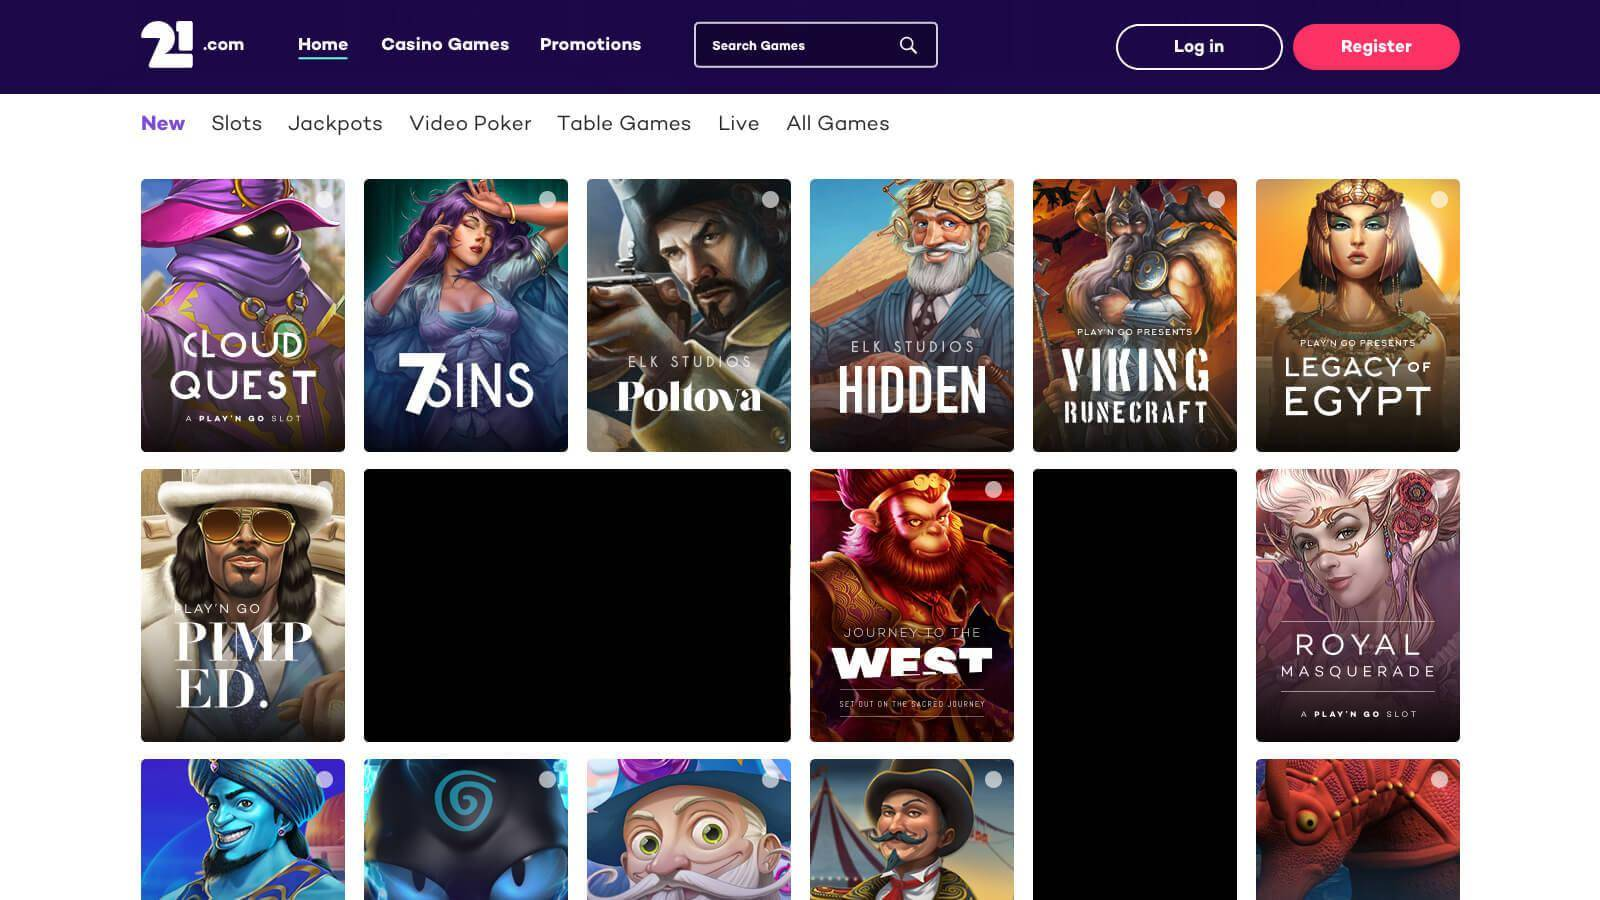 Best Online Casino No Deposit Bonus Codes 2018